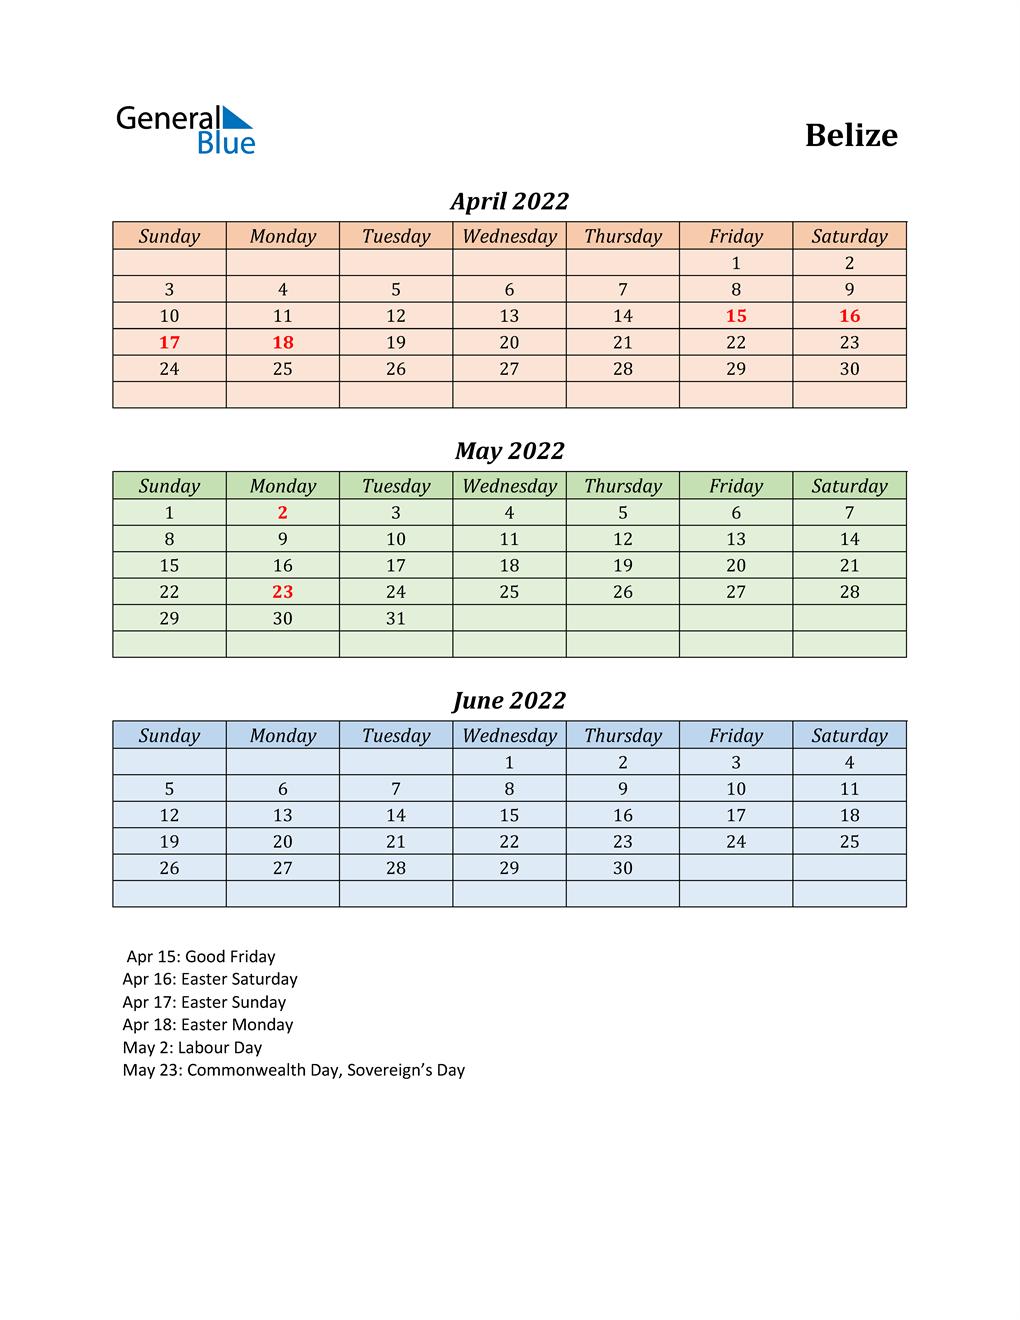 Q2 2022 Holiday Calendar - Belize